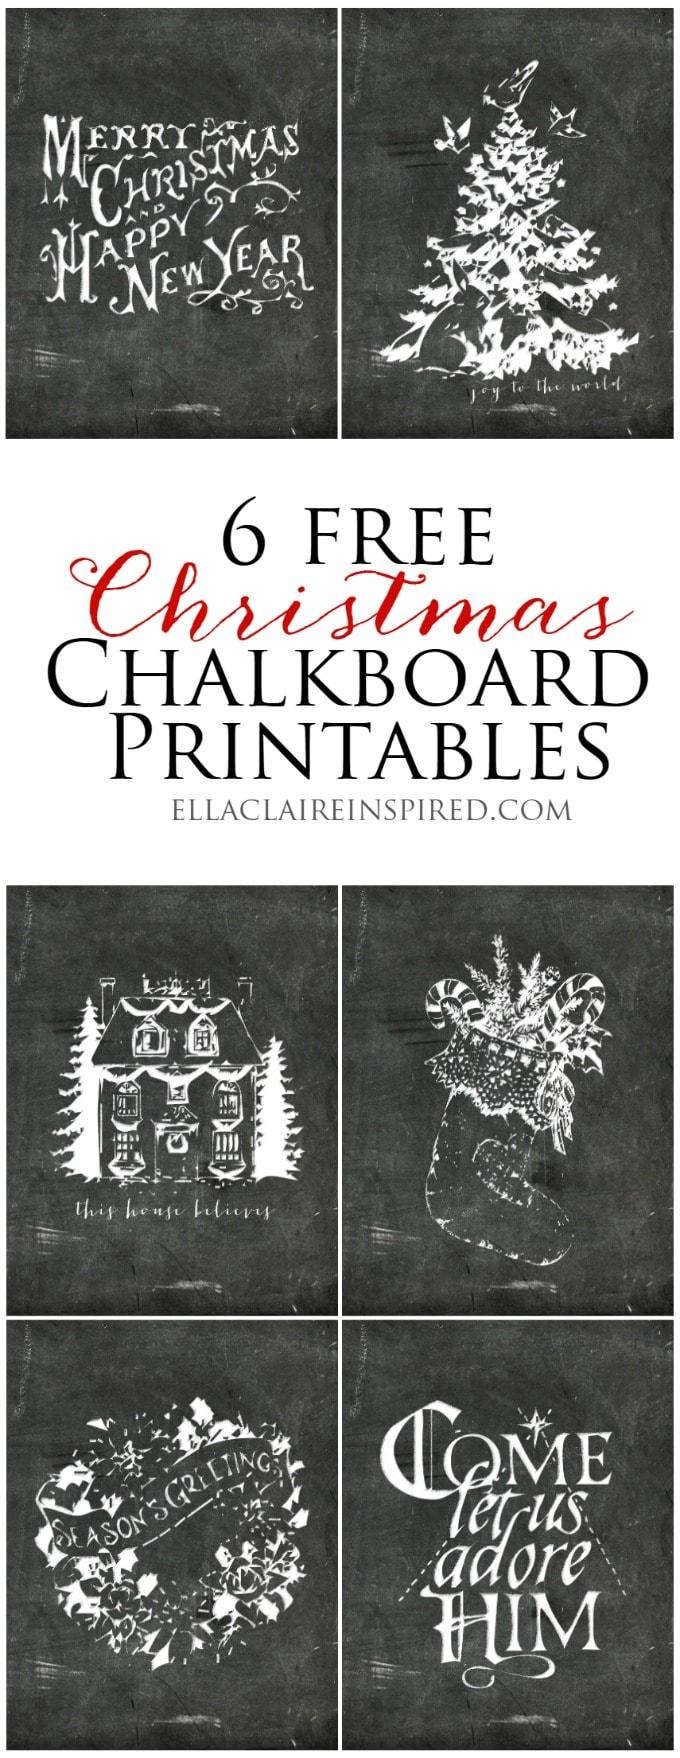 6 free Chalkboard Printables